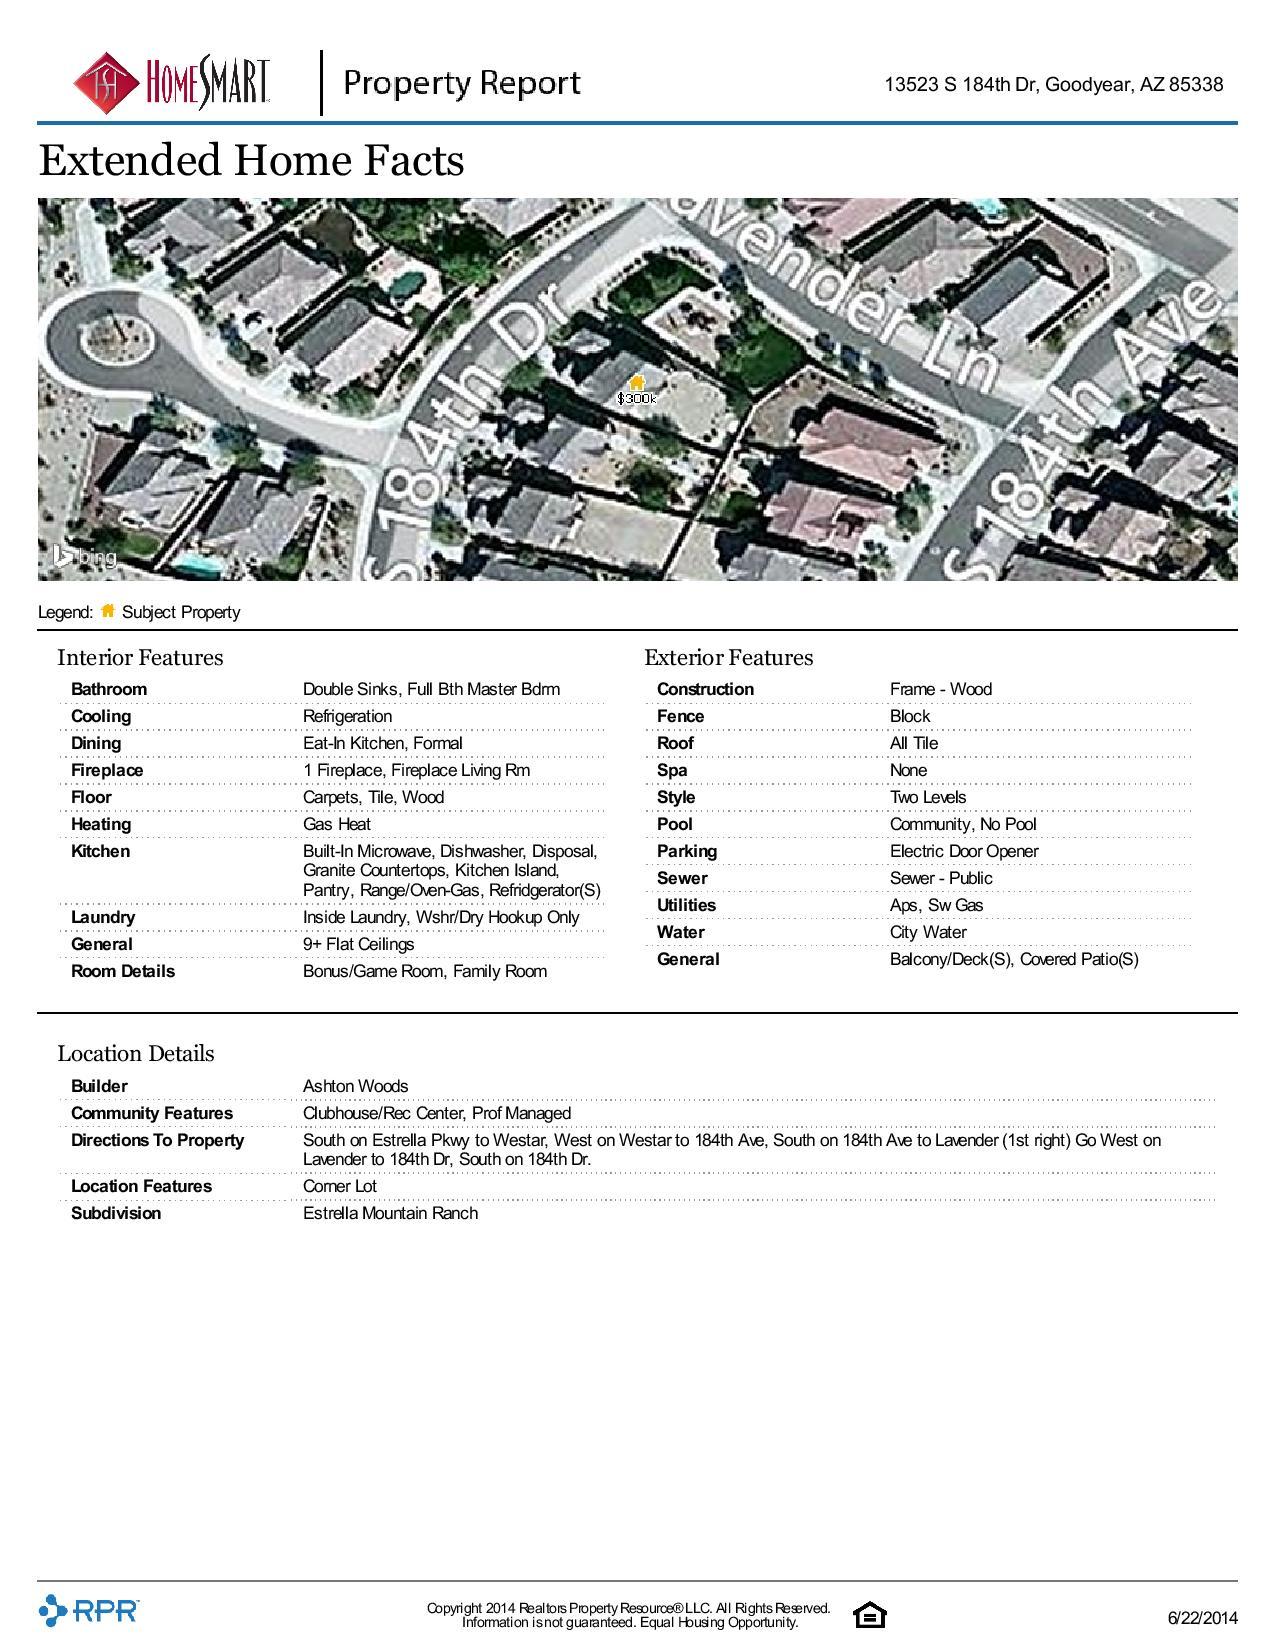 13523-S-184th-Dr-Goodyear-AZ-85338-page-004